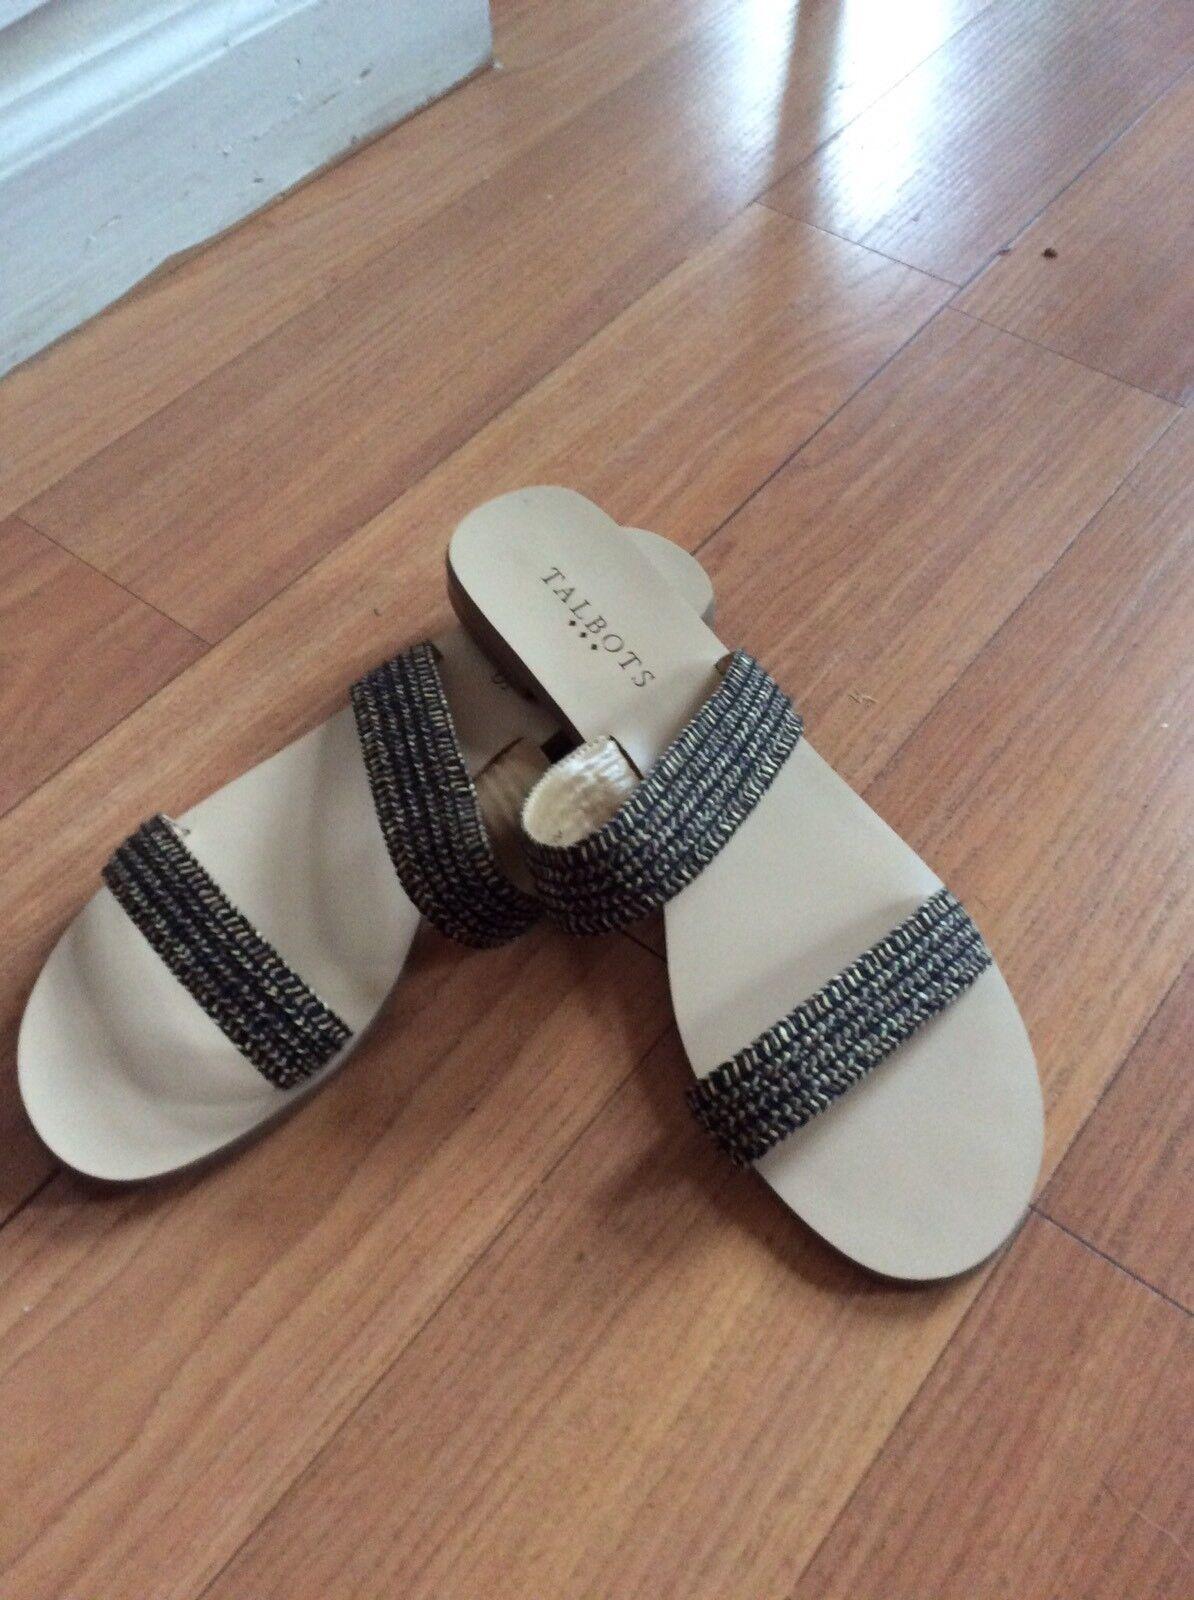 NWOB-  Talbots  Brown & Tan  Strappy Sandals  Talbots Size 8M 5a5845